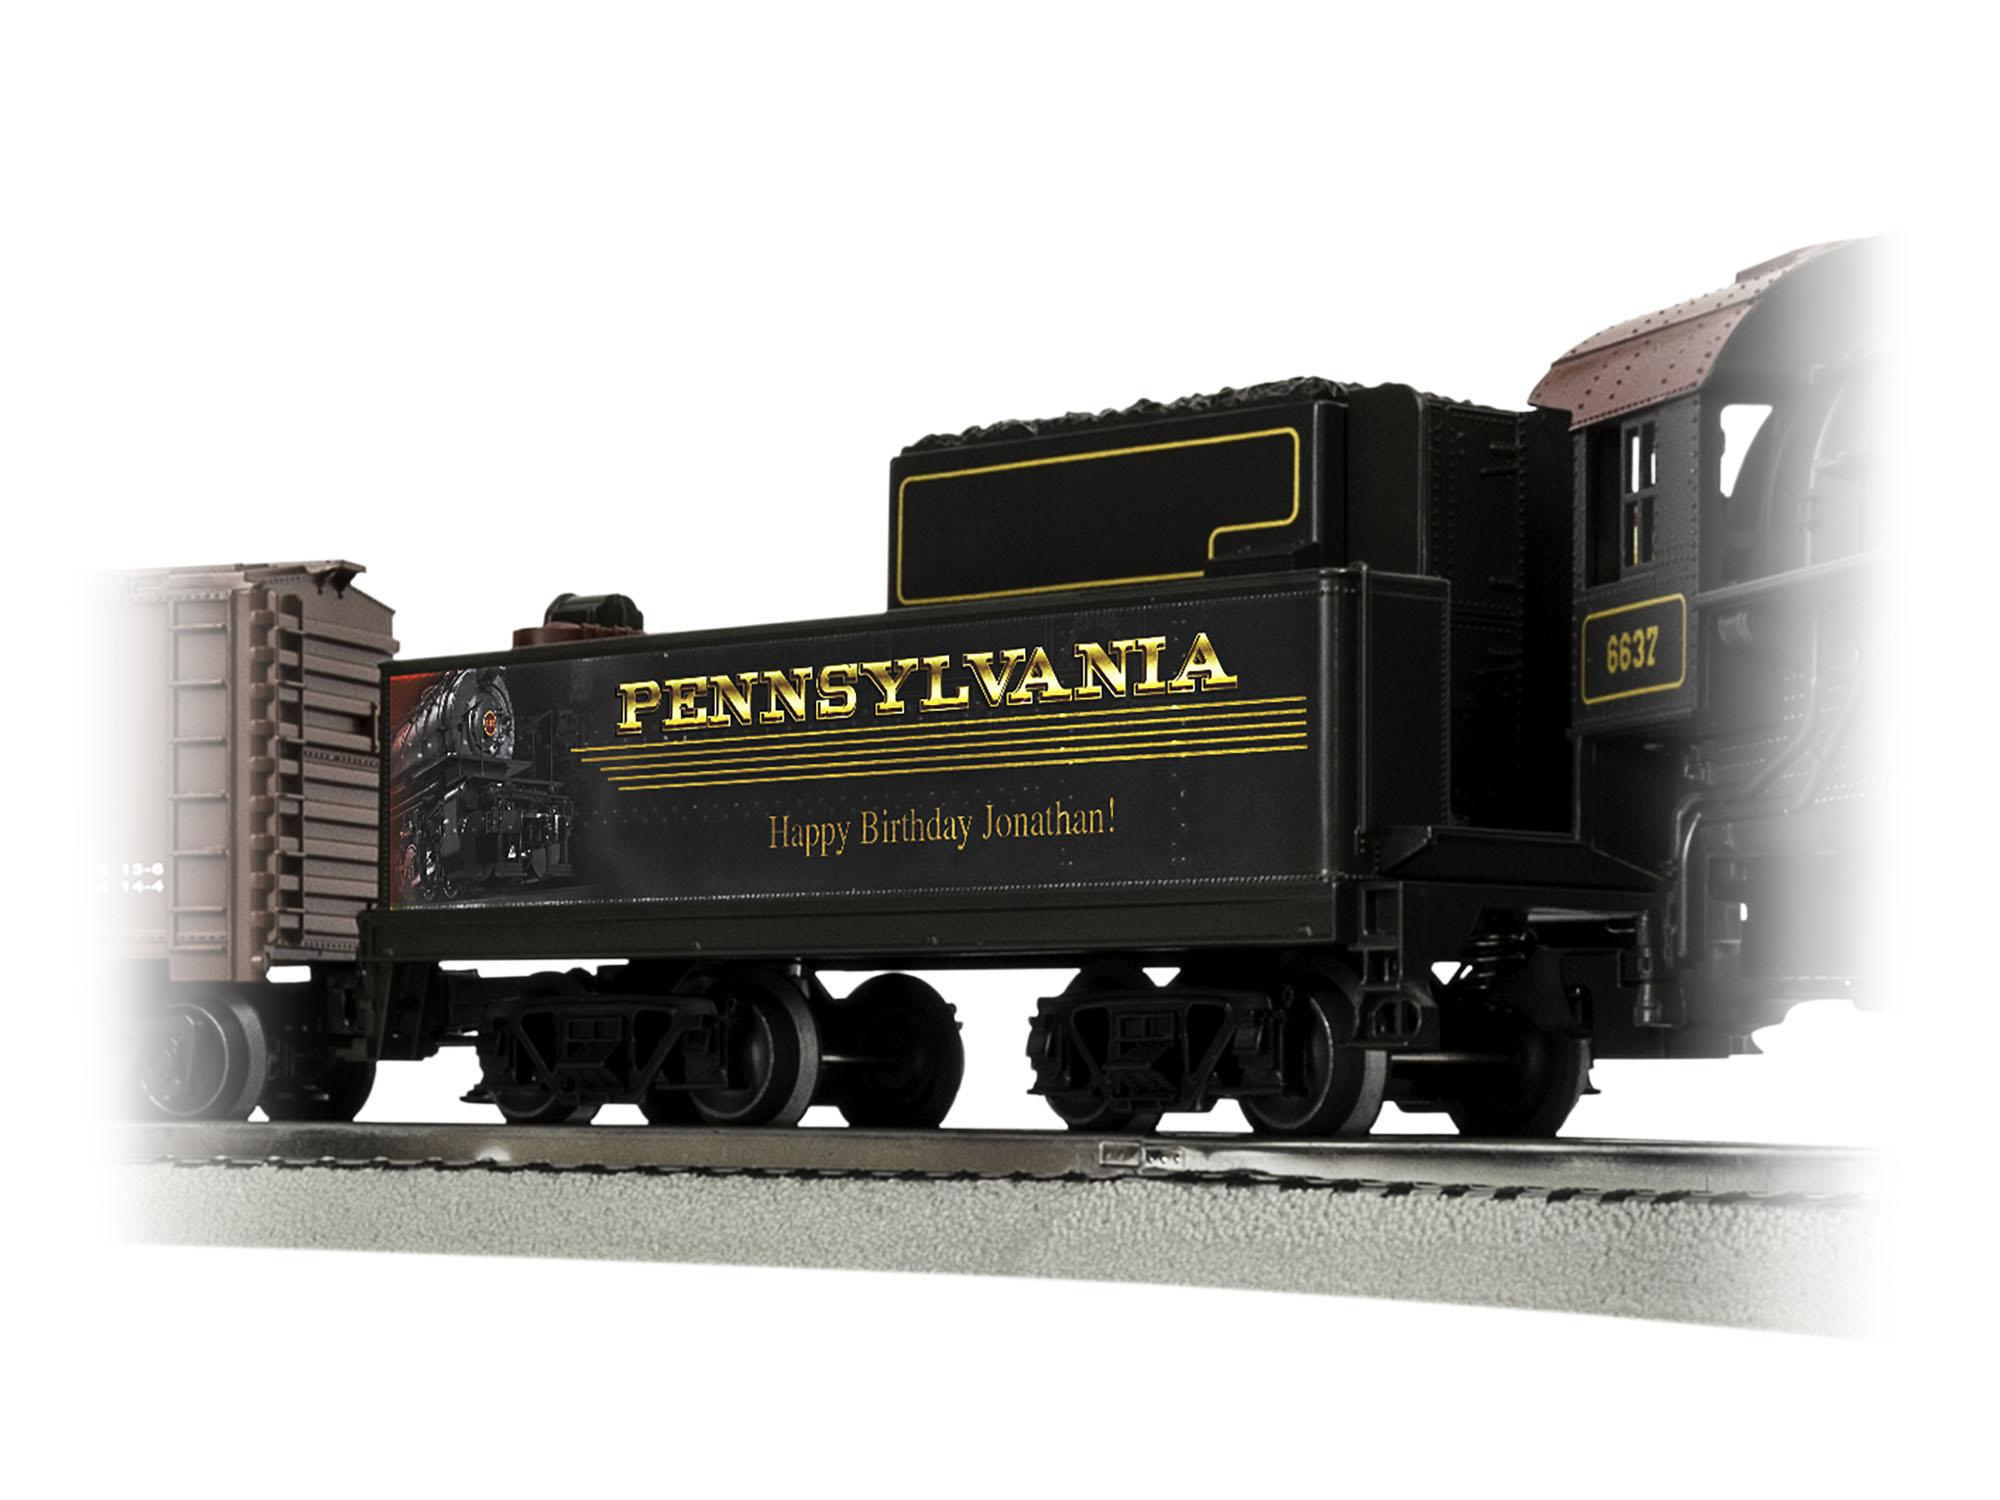 lionel how-to for starting model railroading hobby